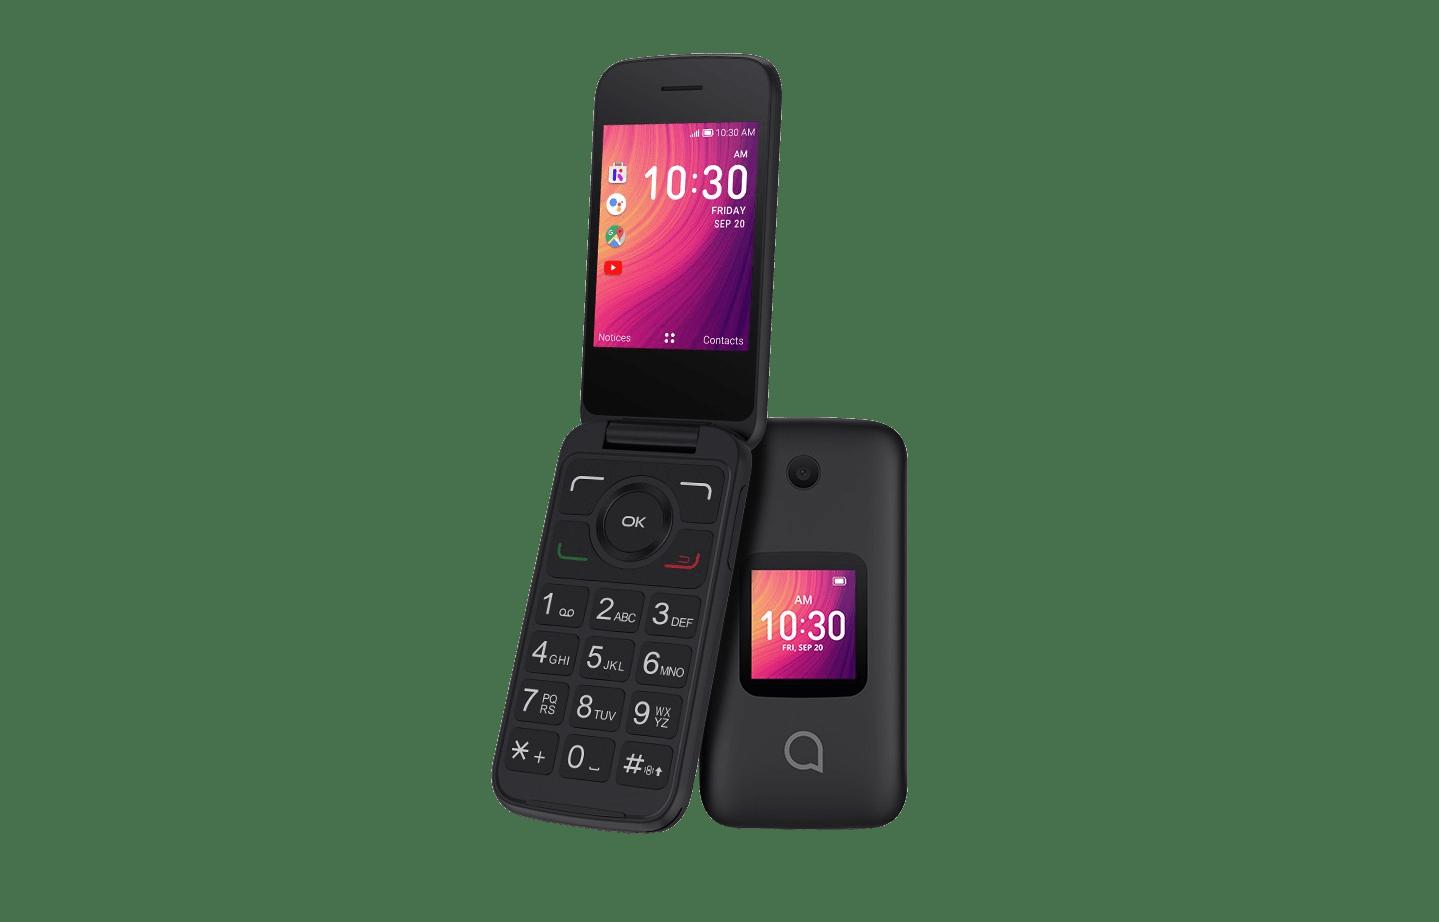 Go Flip 3 from T-Mobile